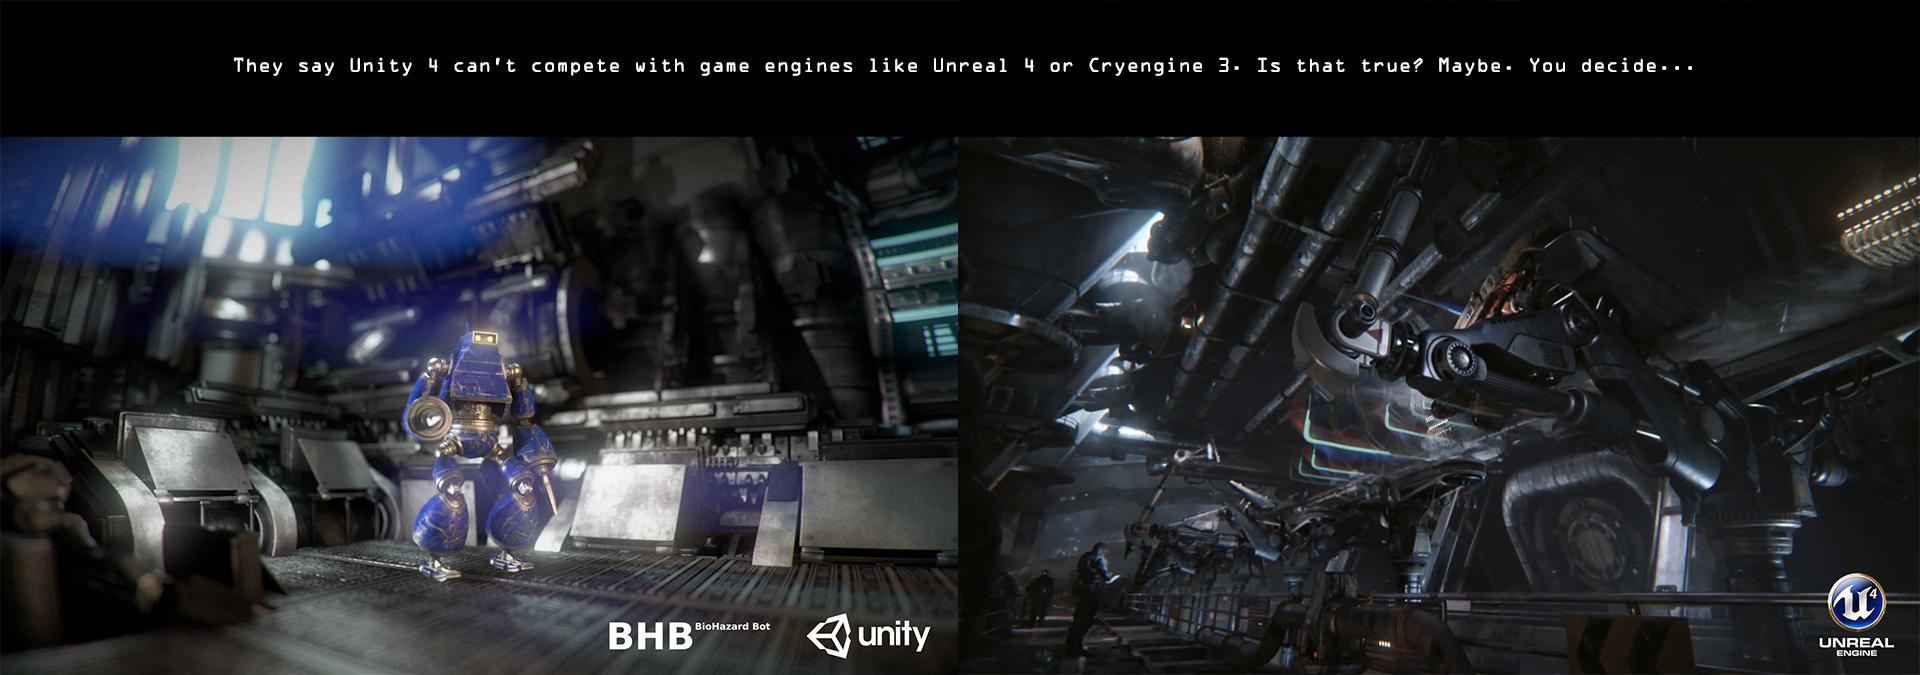 Unreal Engine 4 FREE... | Page 8 | Unity Community